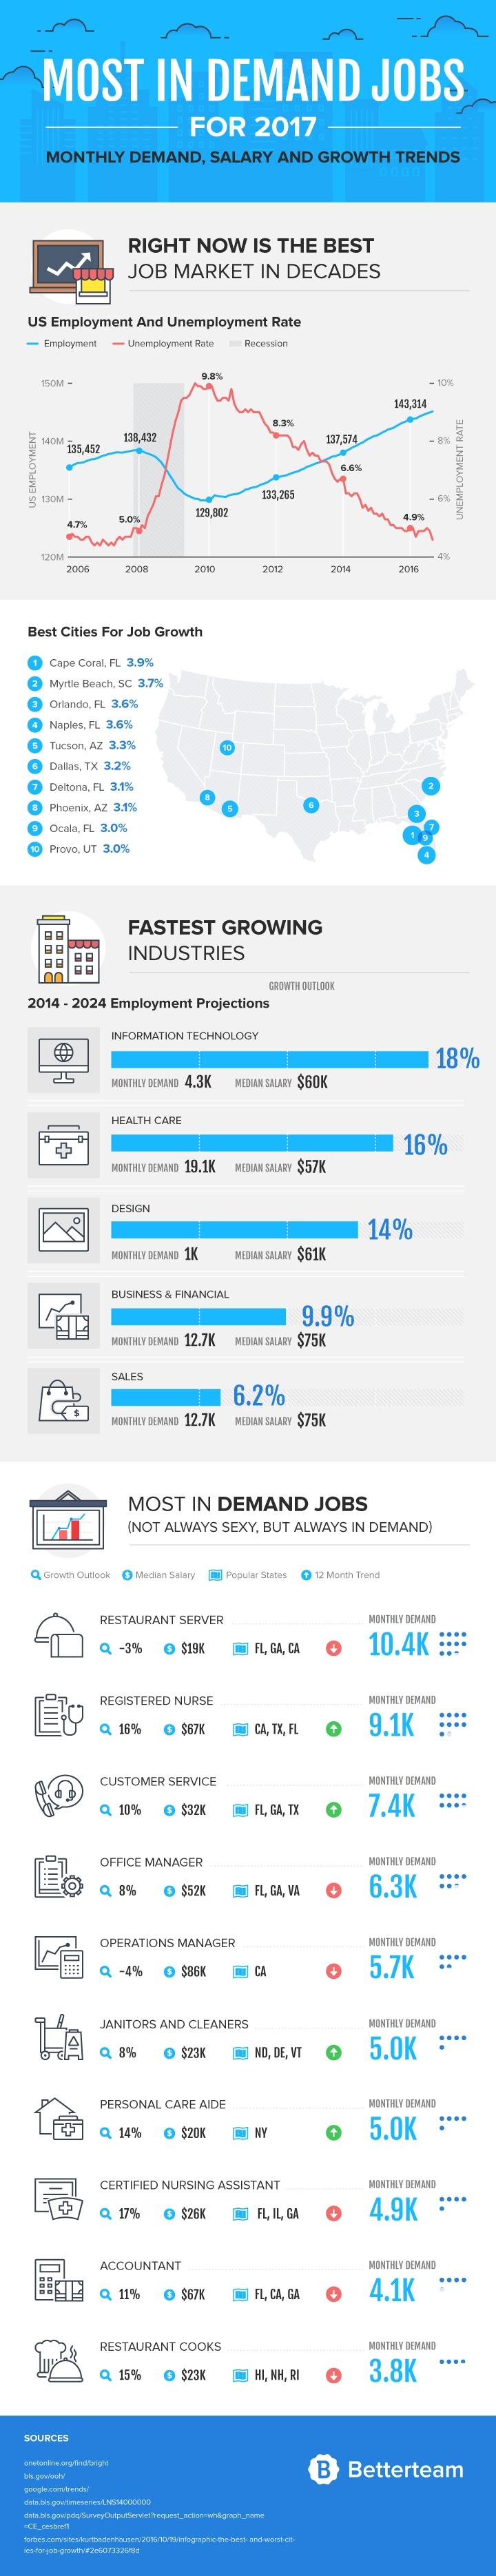 most-in-demand-jobs-2017.jpg